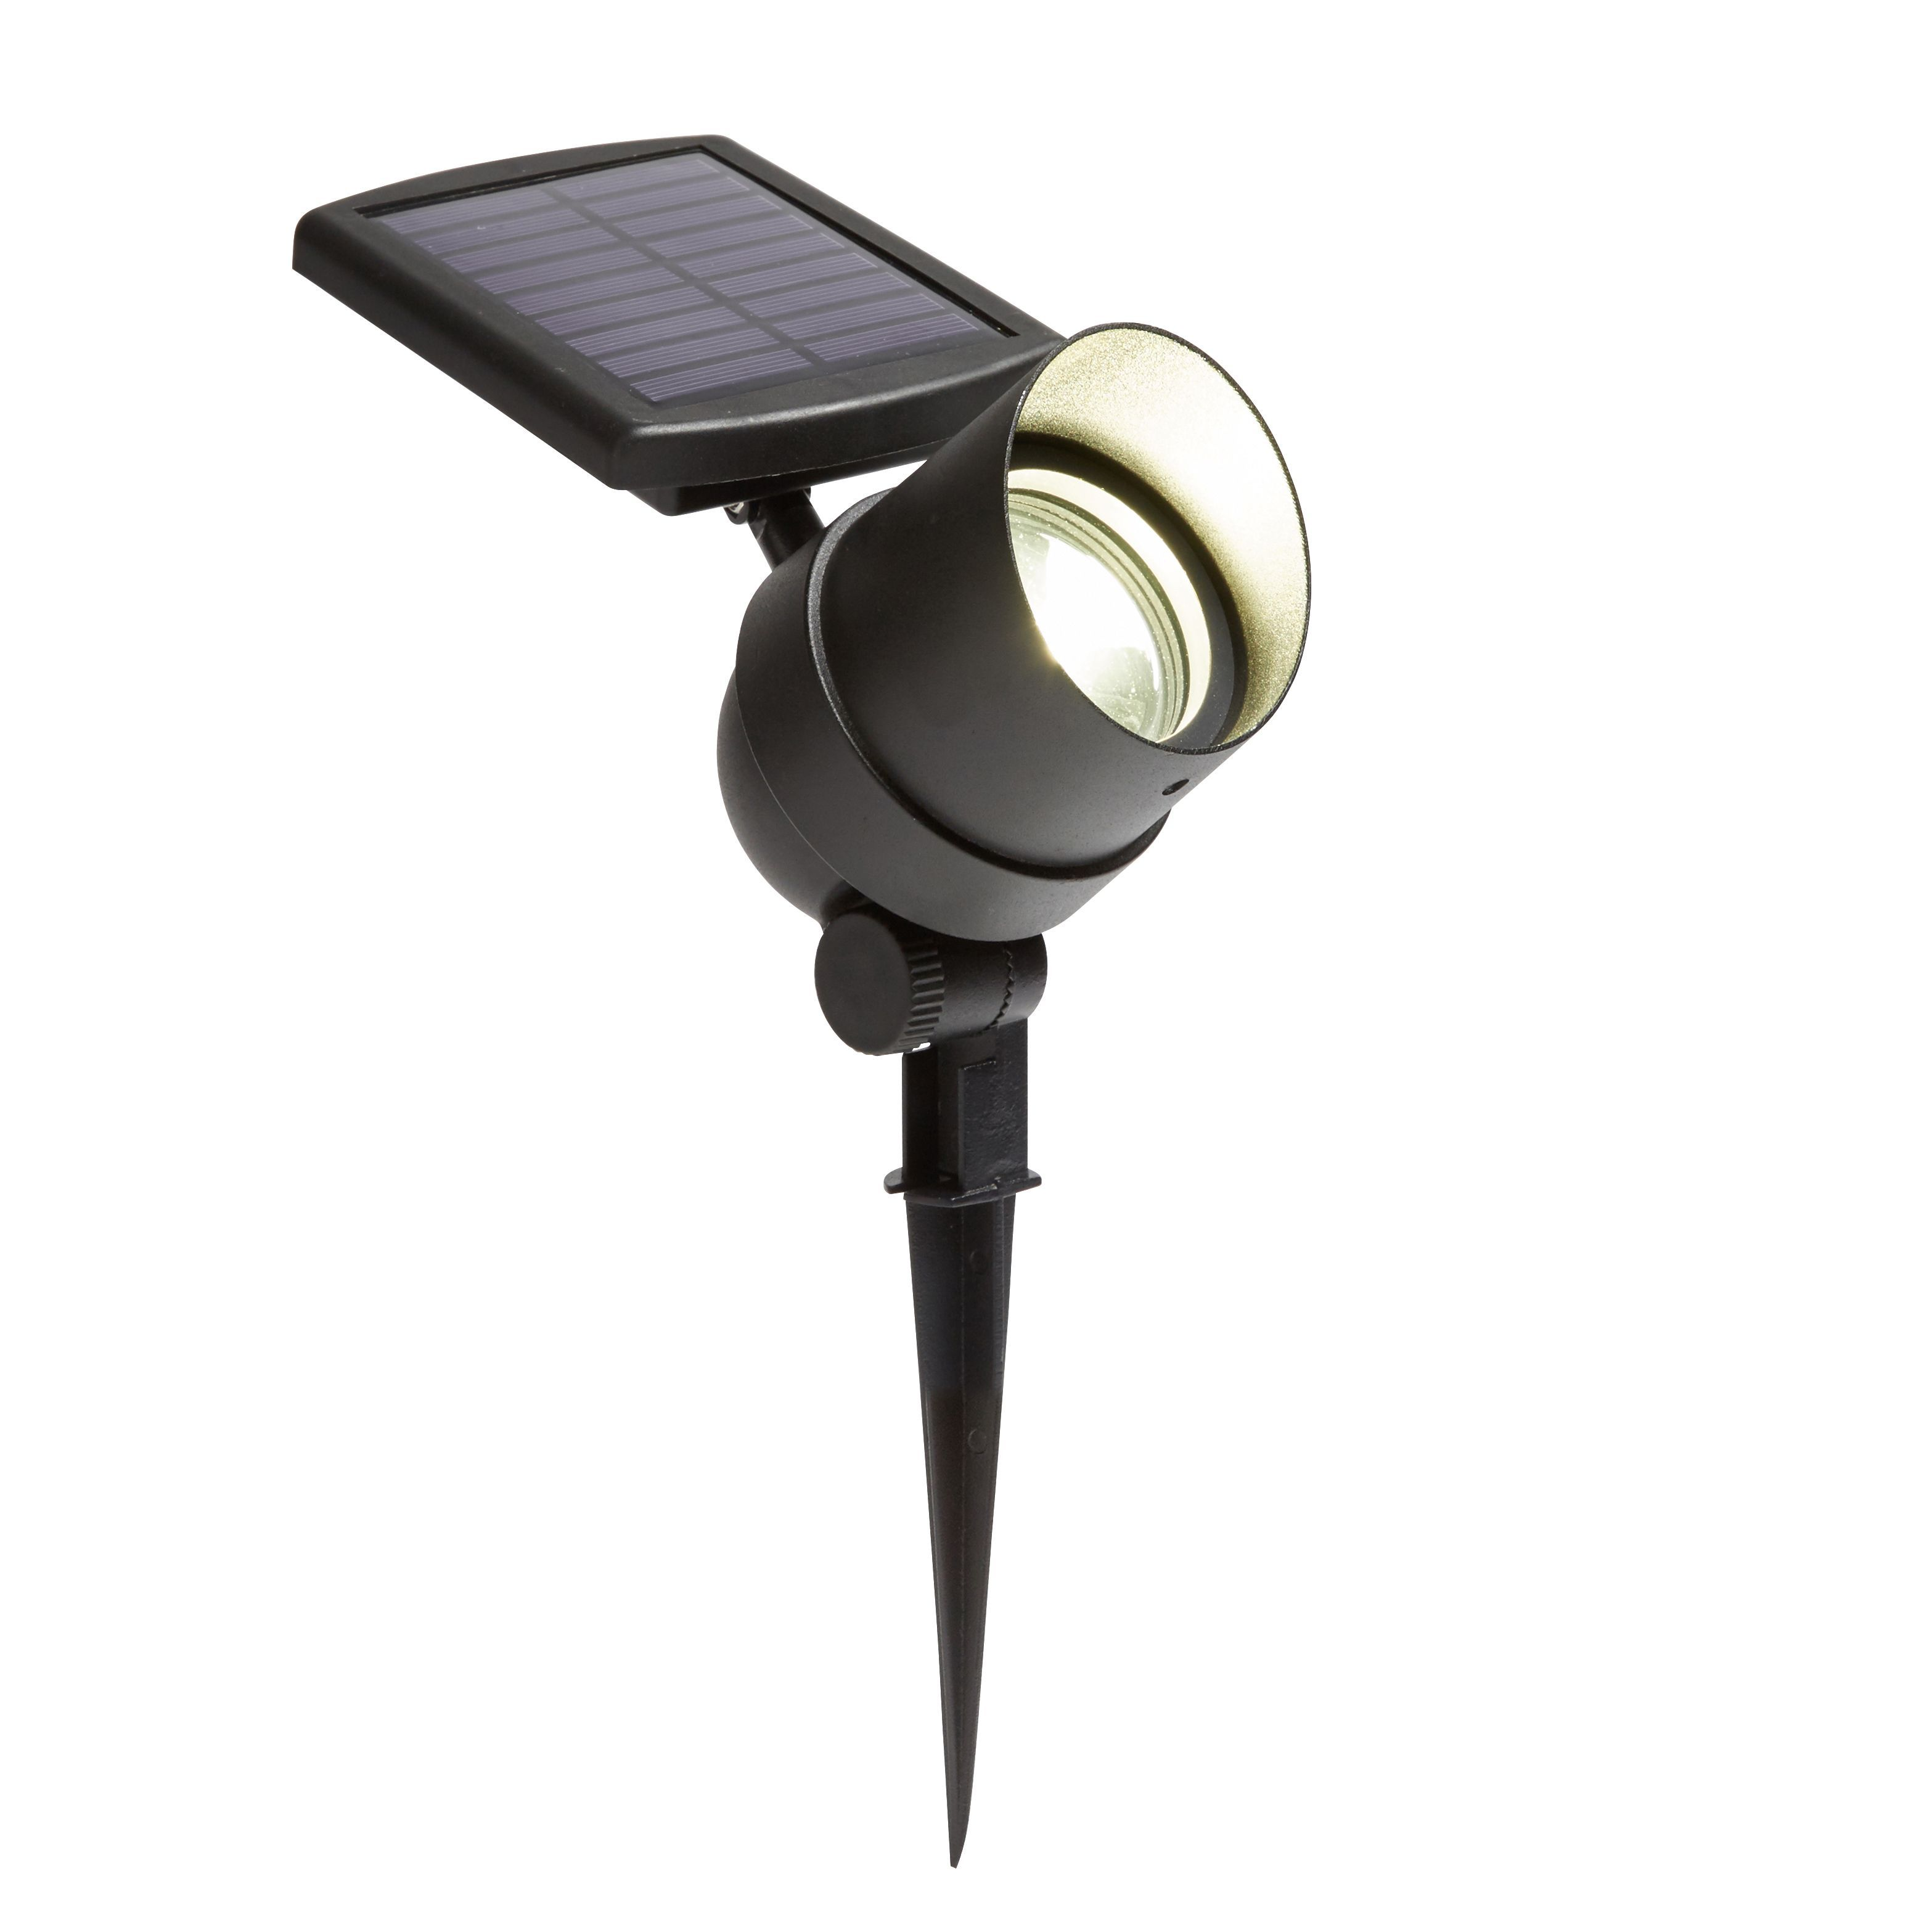 Blooma Telemus Black Solar Powered Led Spot Light